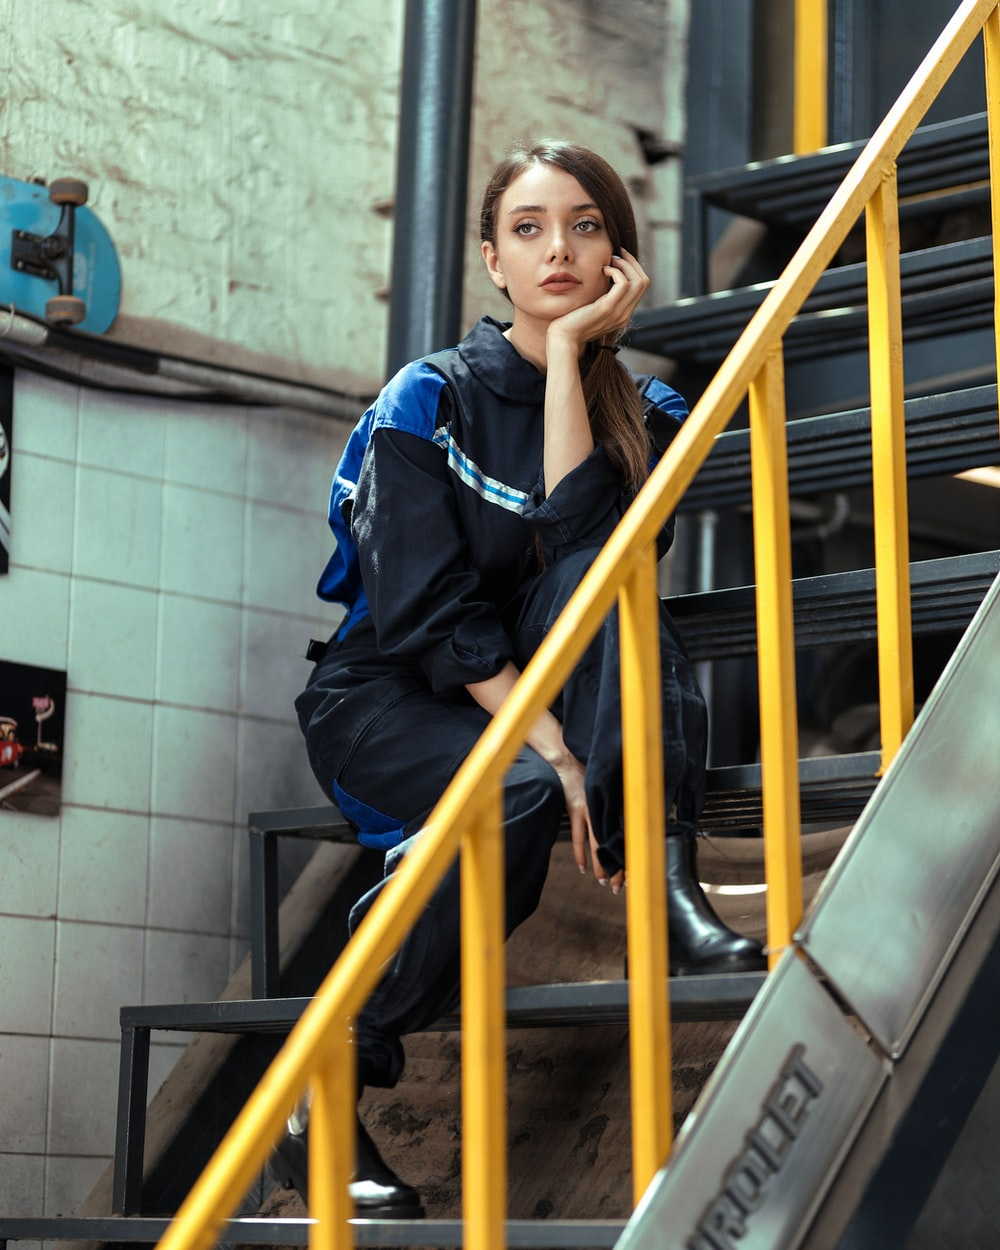 woman in blue and black jacket standing beside yellow metal railings